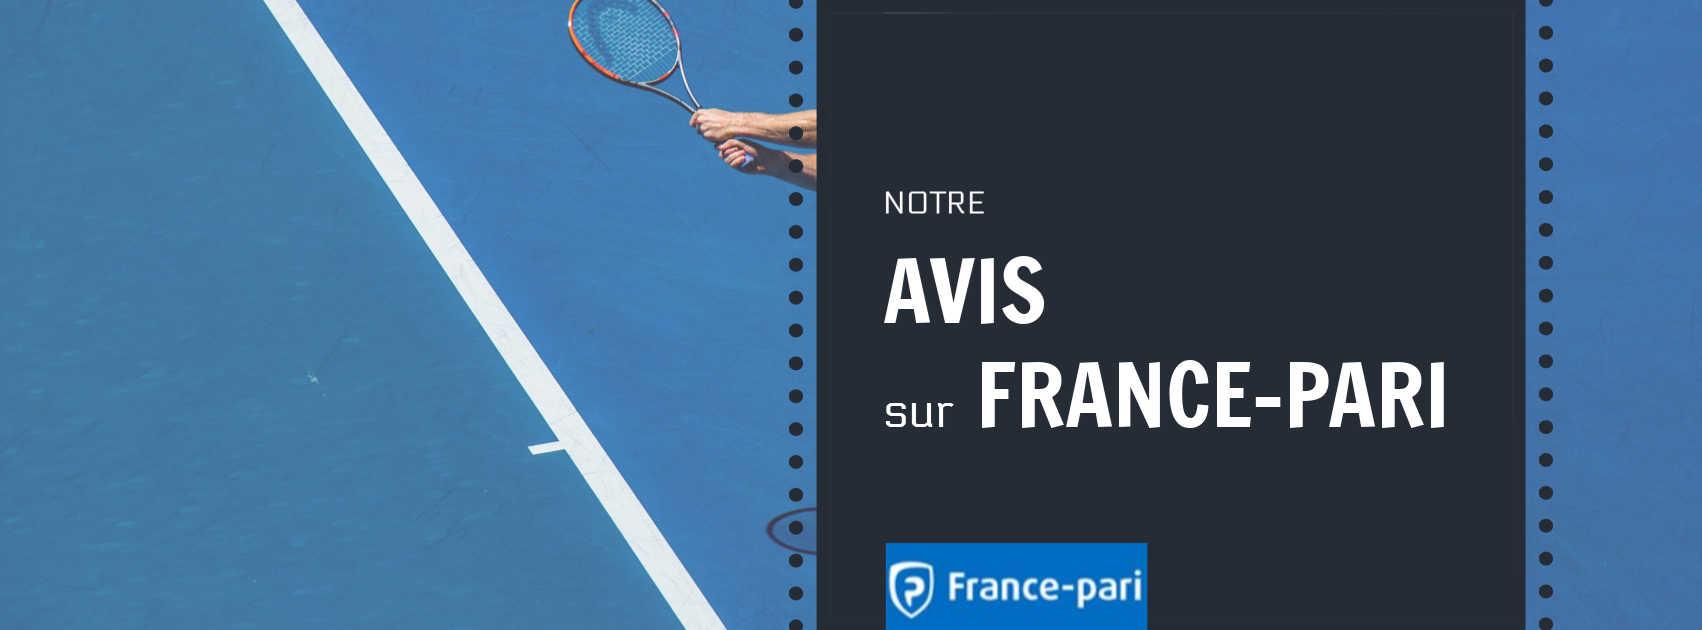 avis site france-pari